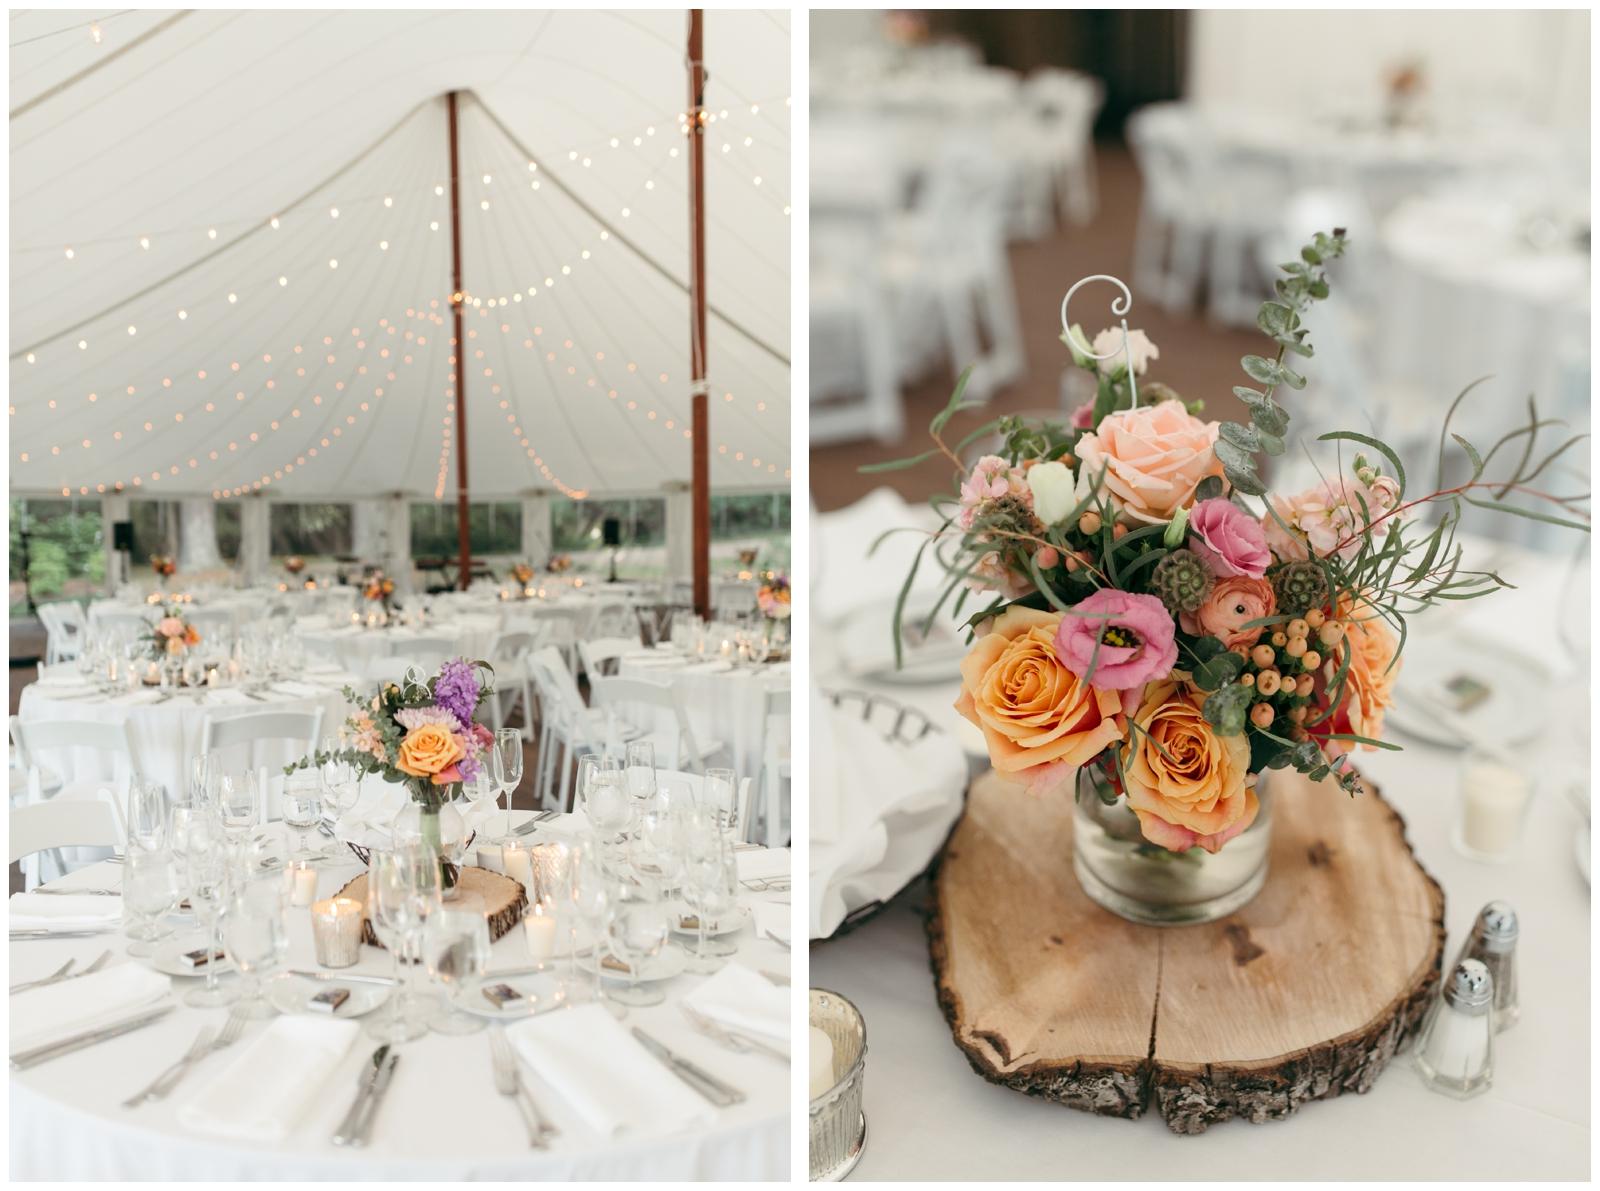 Moraine-Farm-wedding-Bailey-Q-Photo-Massachusetts-wedding-photpgrapher-100.jpg